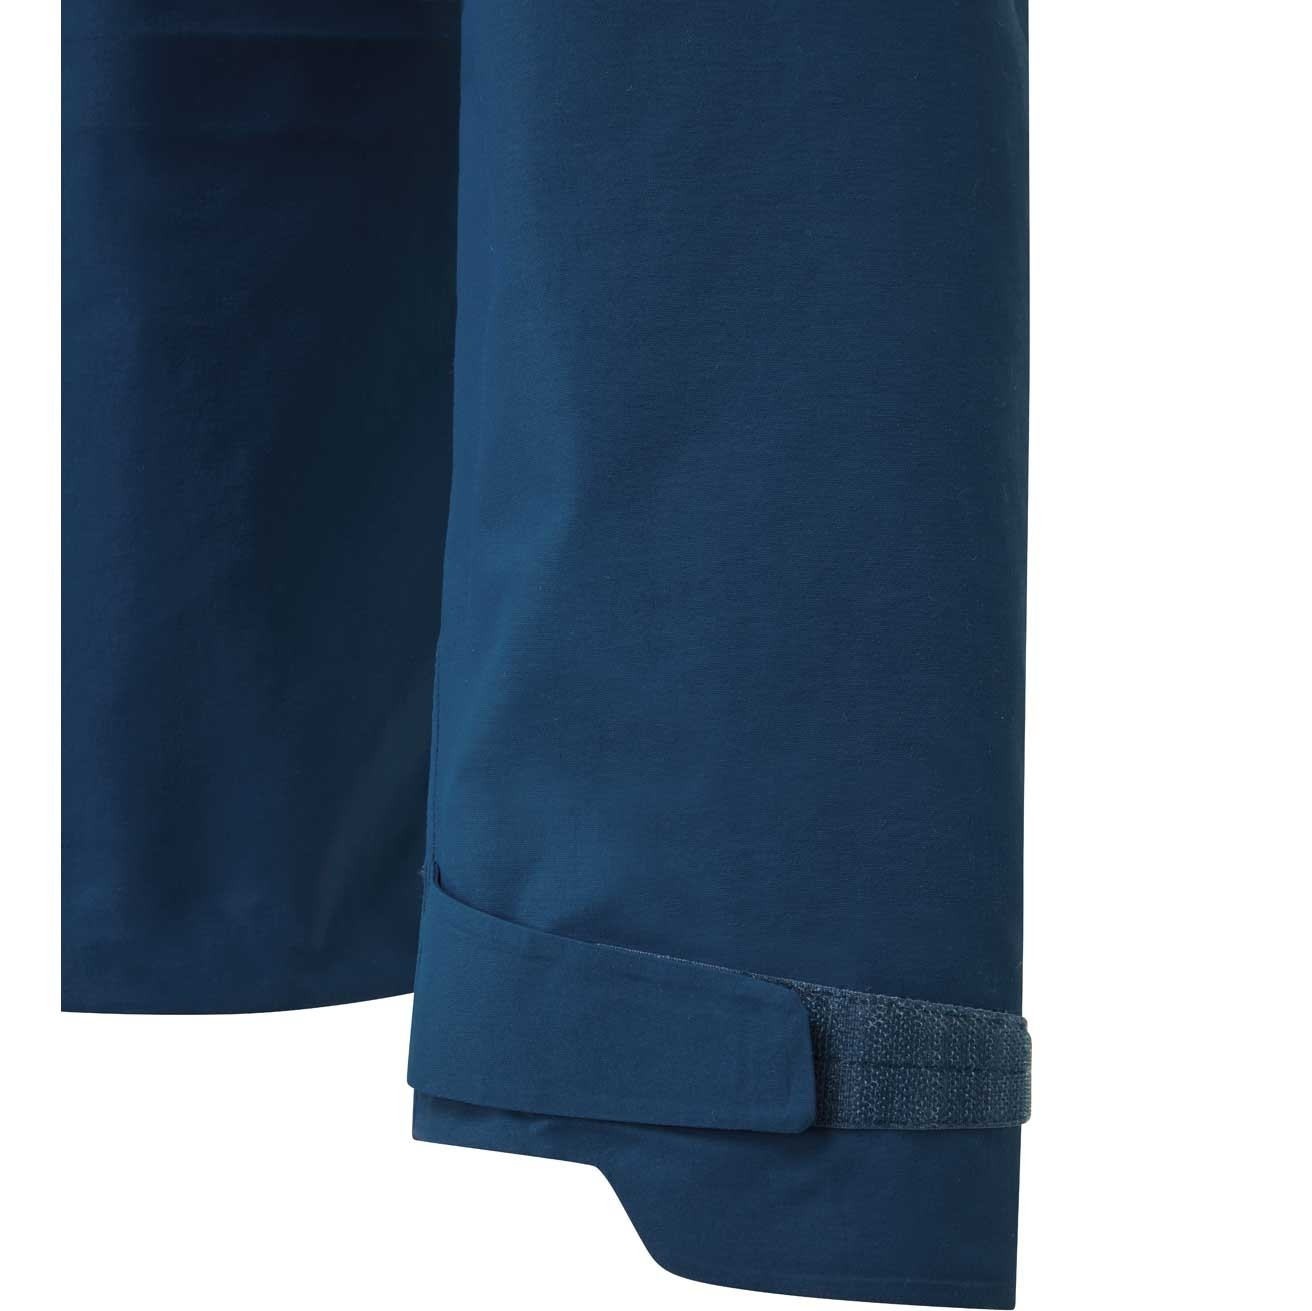 Rab Latok GTX Waterproof Jacket - Men's - Ink